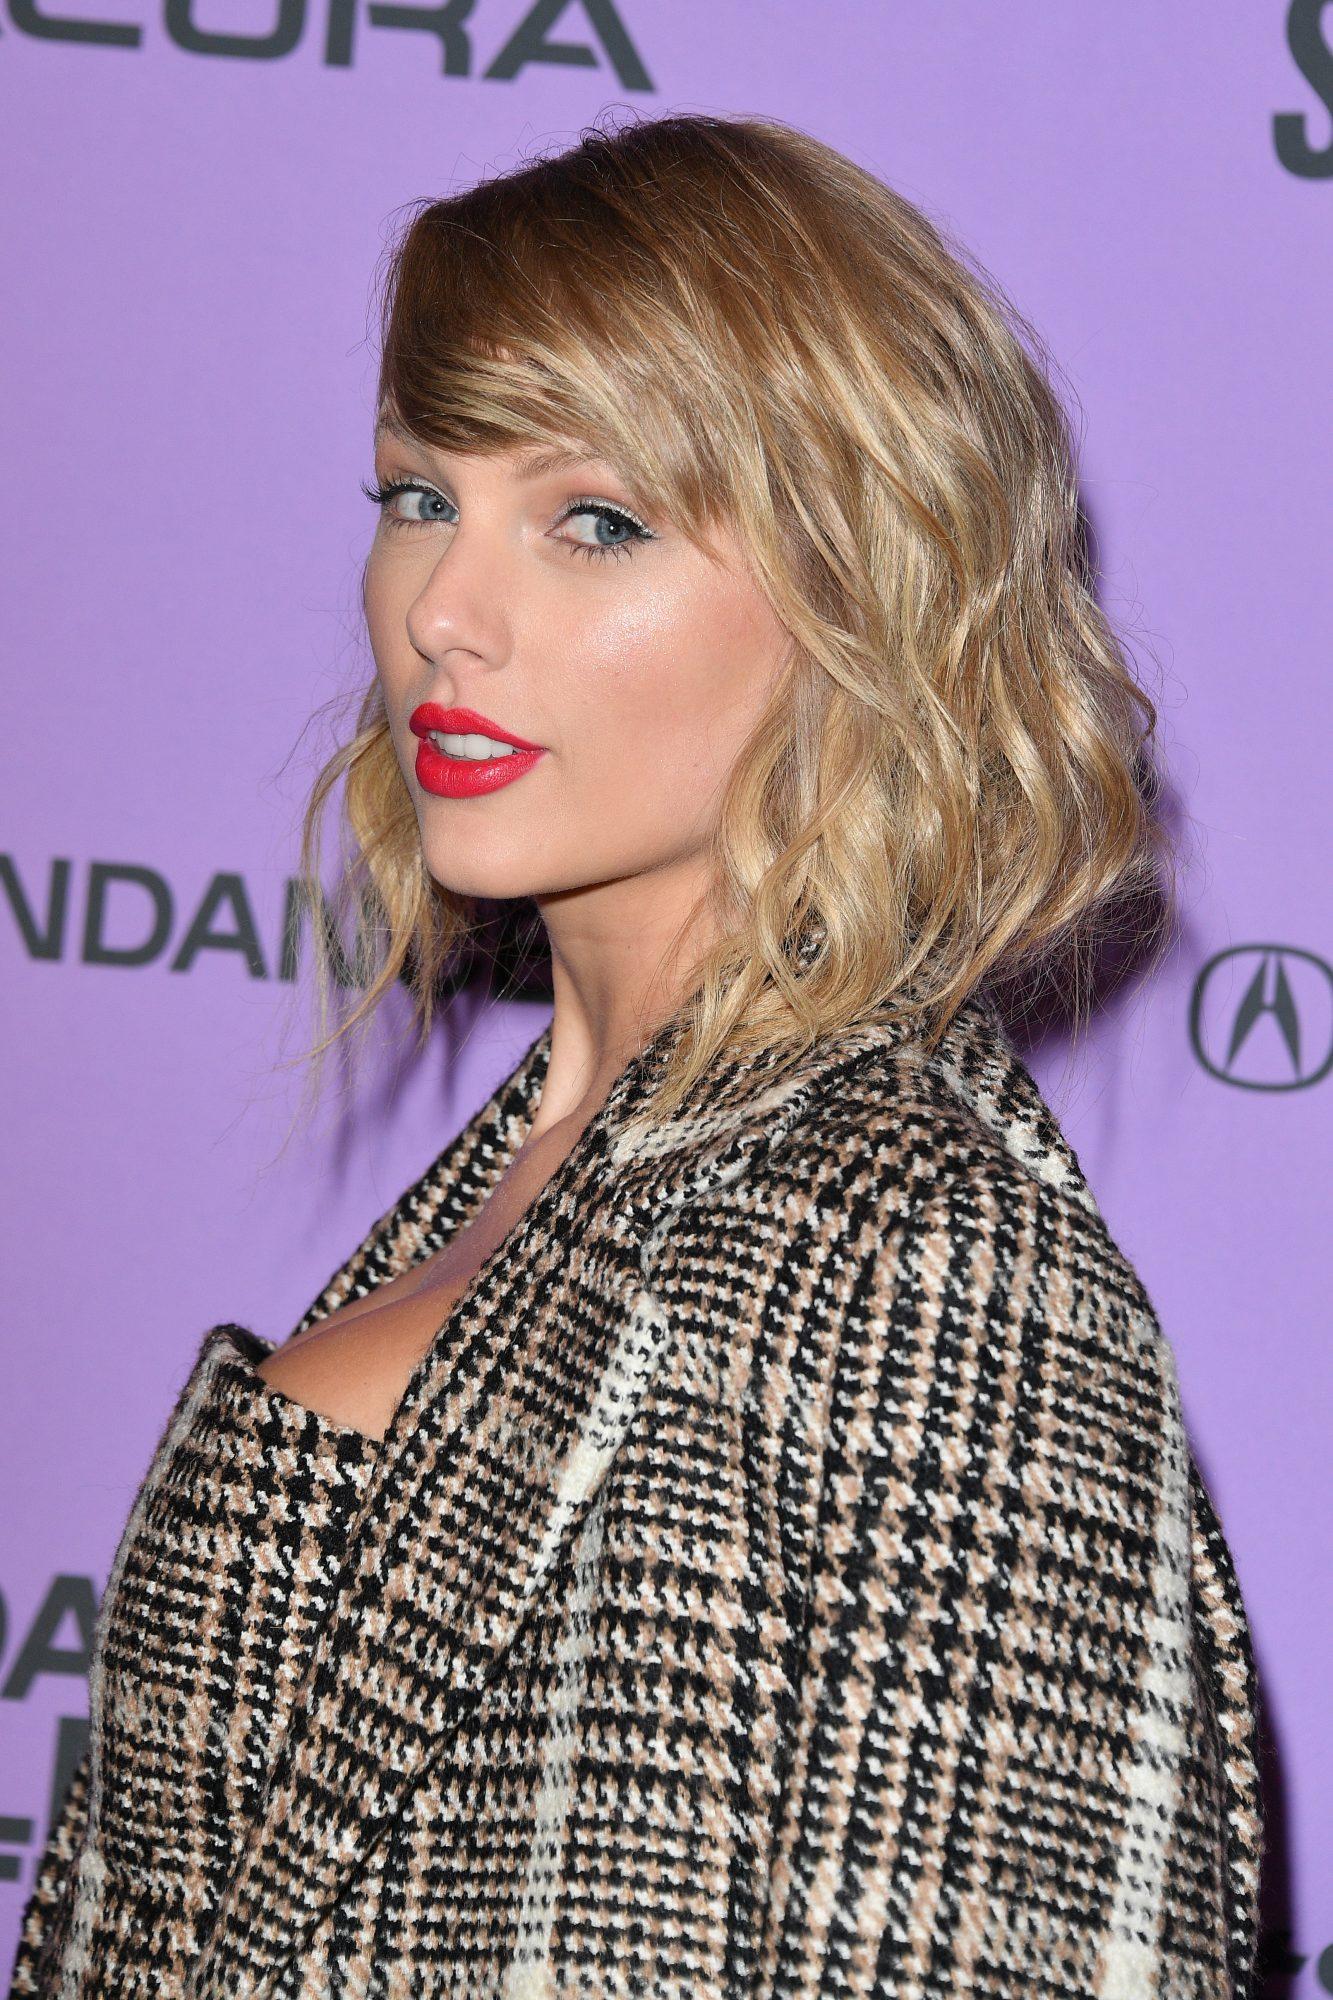 Taylor Swift Miss Americana premiere